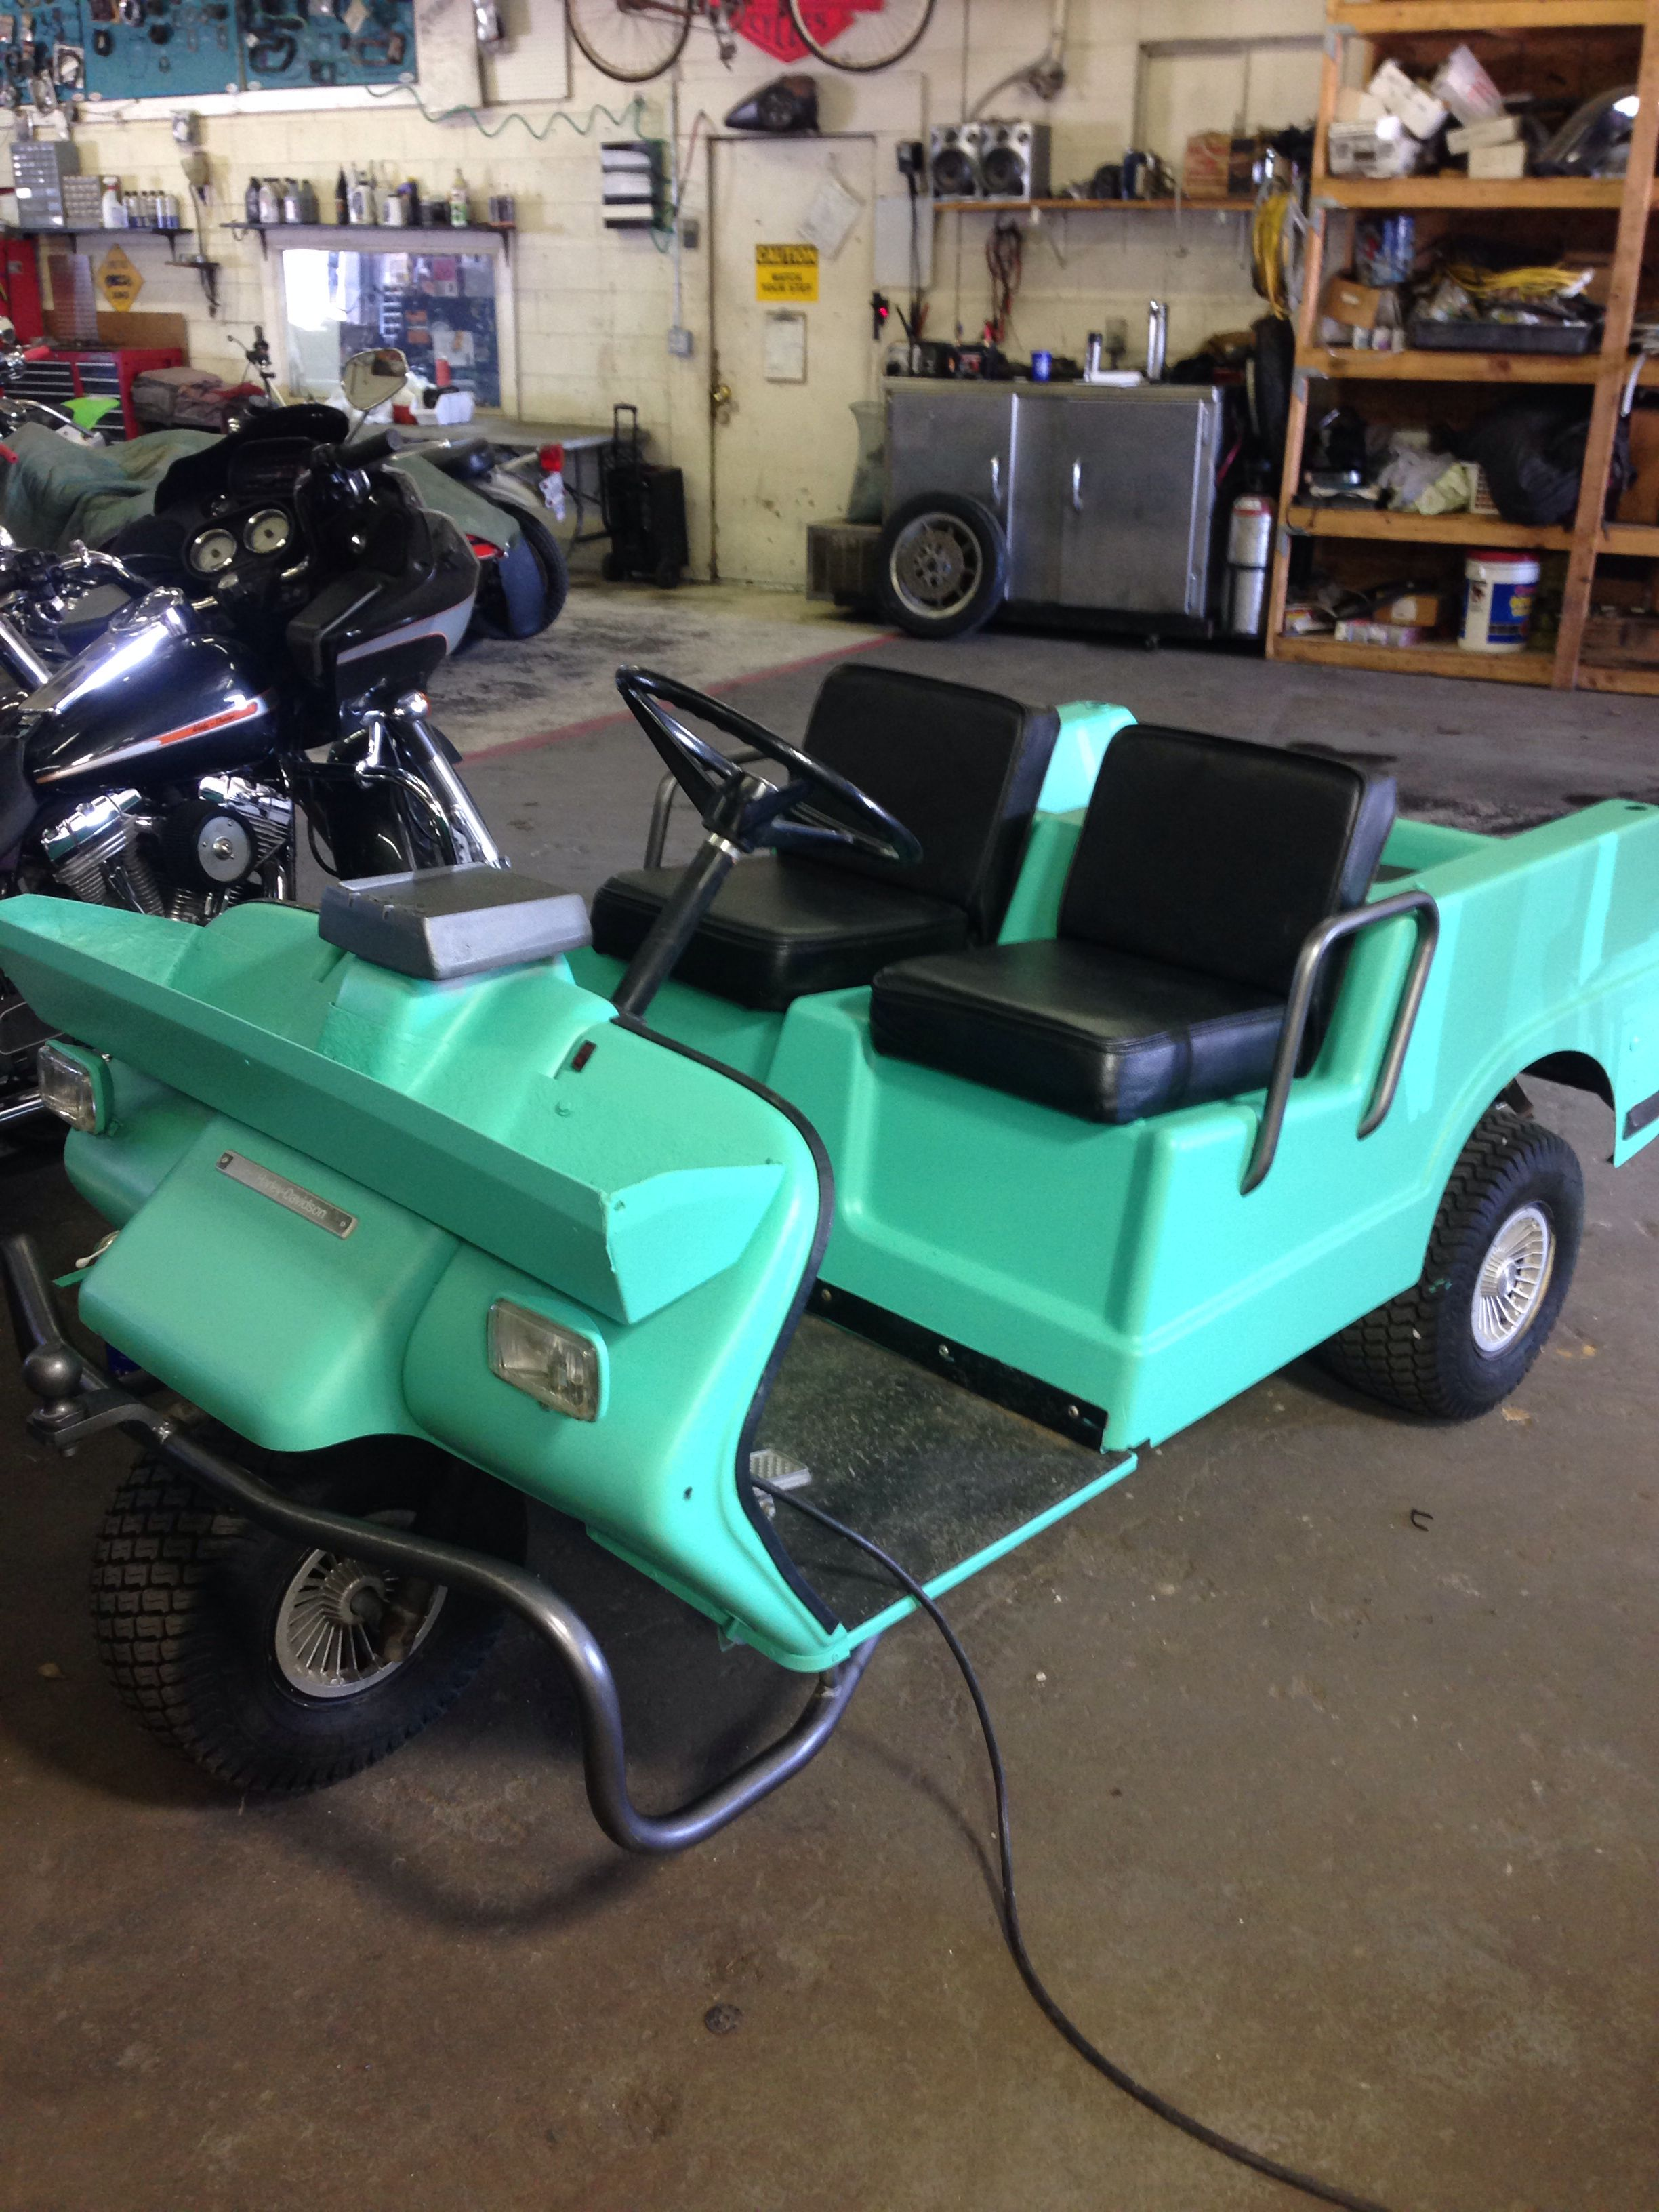 amf harley davidson golf cart wiring diagram viper 5305v seat covers velcromag